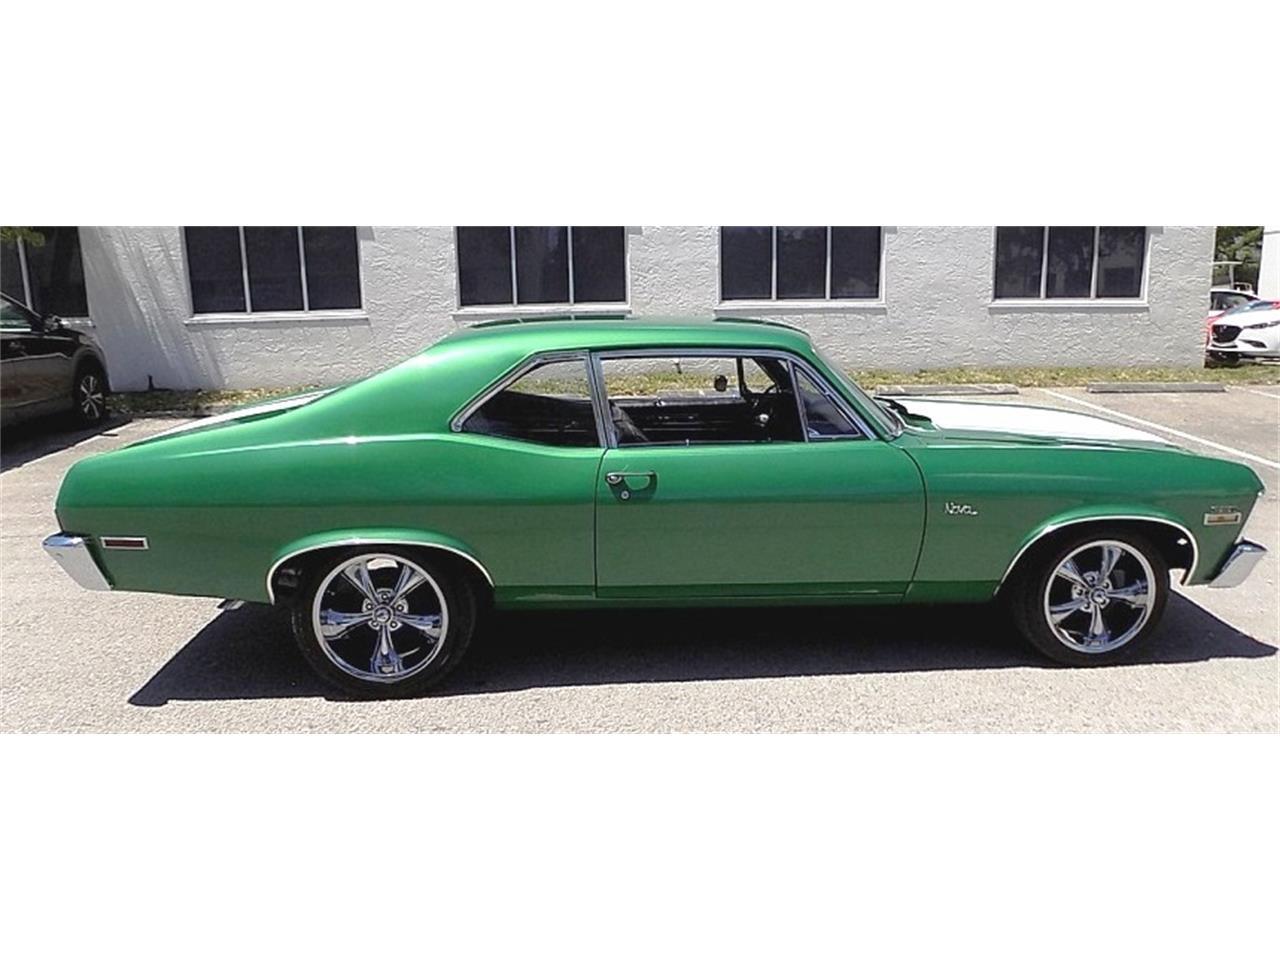 Large Picture of Classic 1972 Chevrolet Nova located in POMPANO BEACH Florida - $24,500.00 - PWF6